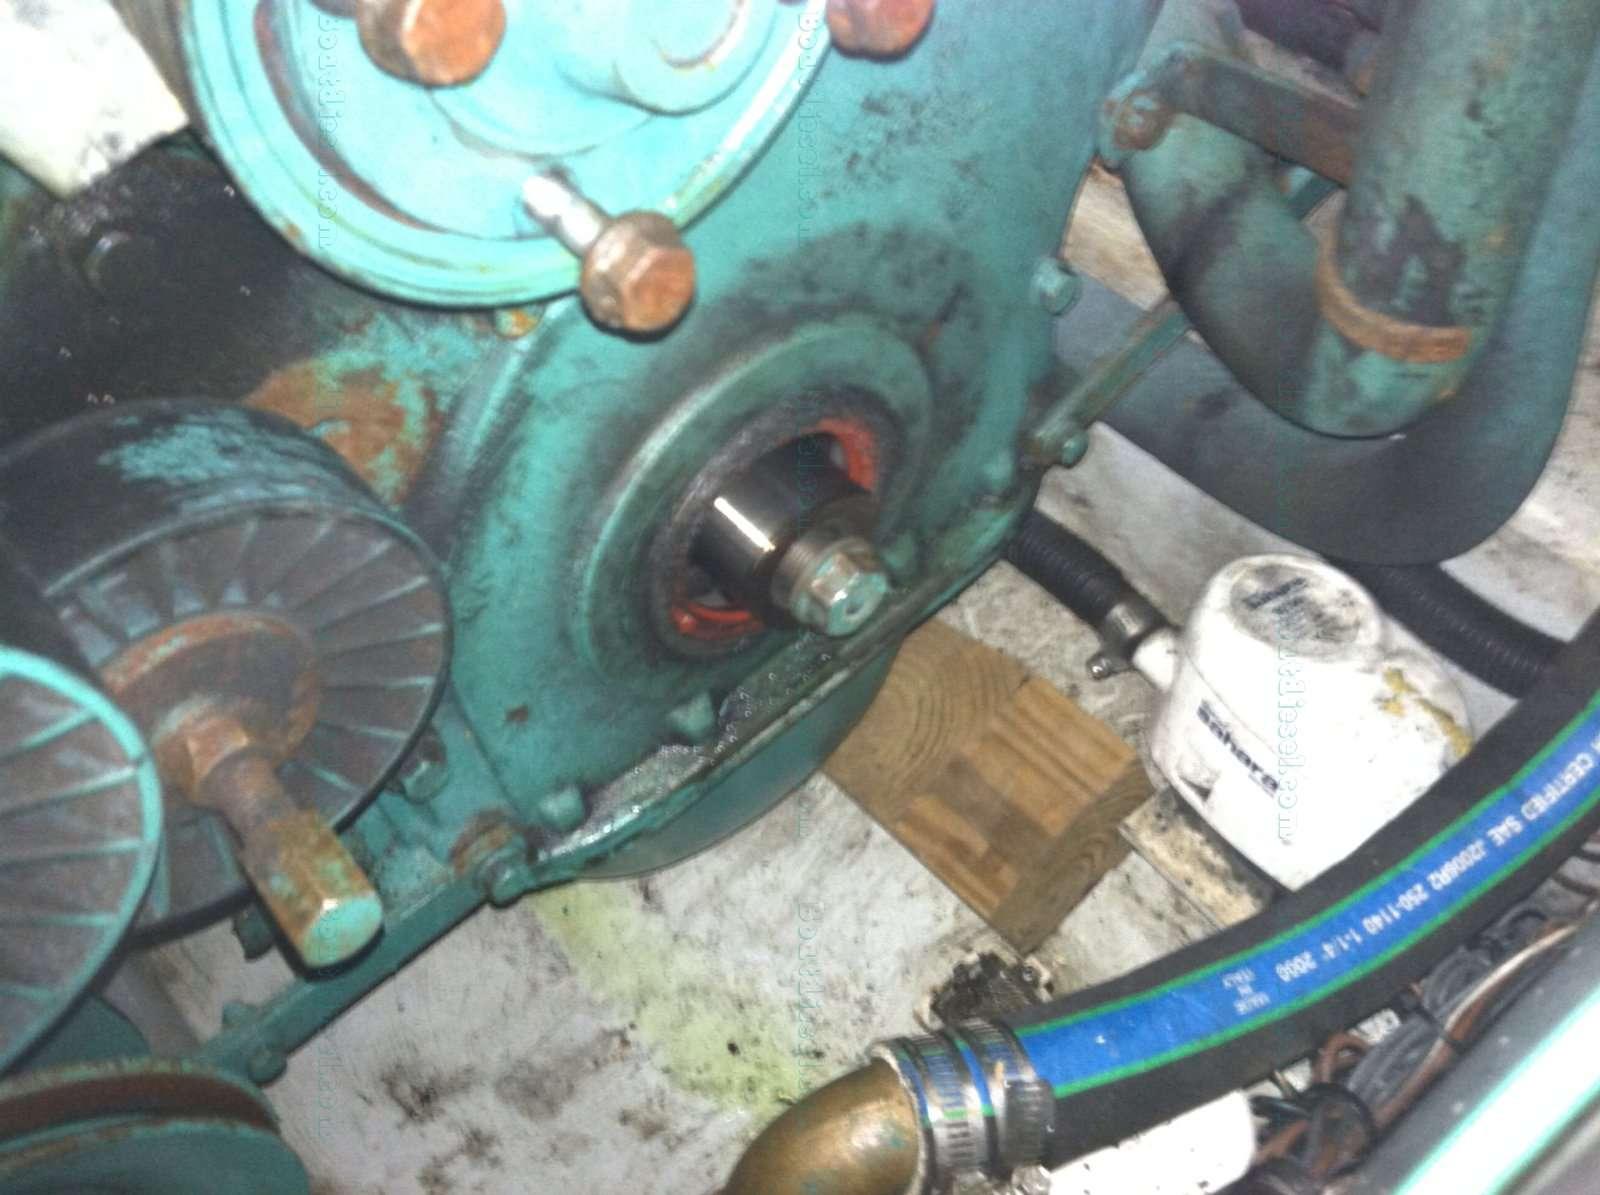 boatdiesel com forums need hub removal tool rh boatdiesel com 04 Volvo S40 Manual volvo penta ad41p workshop manual